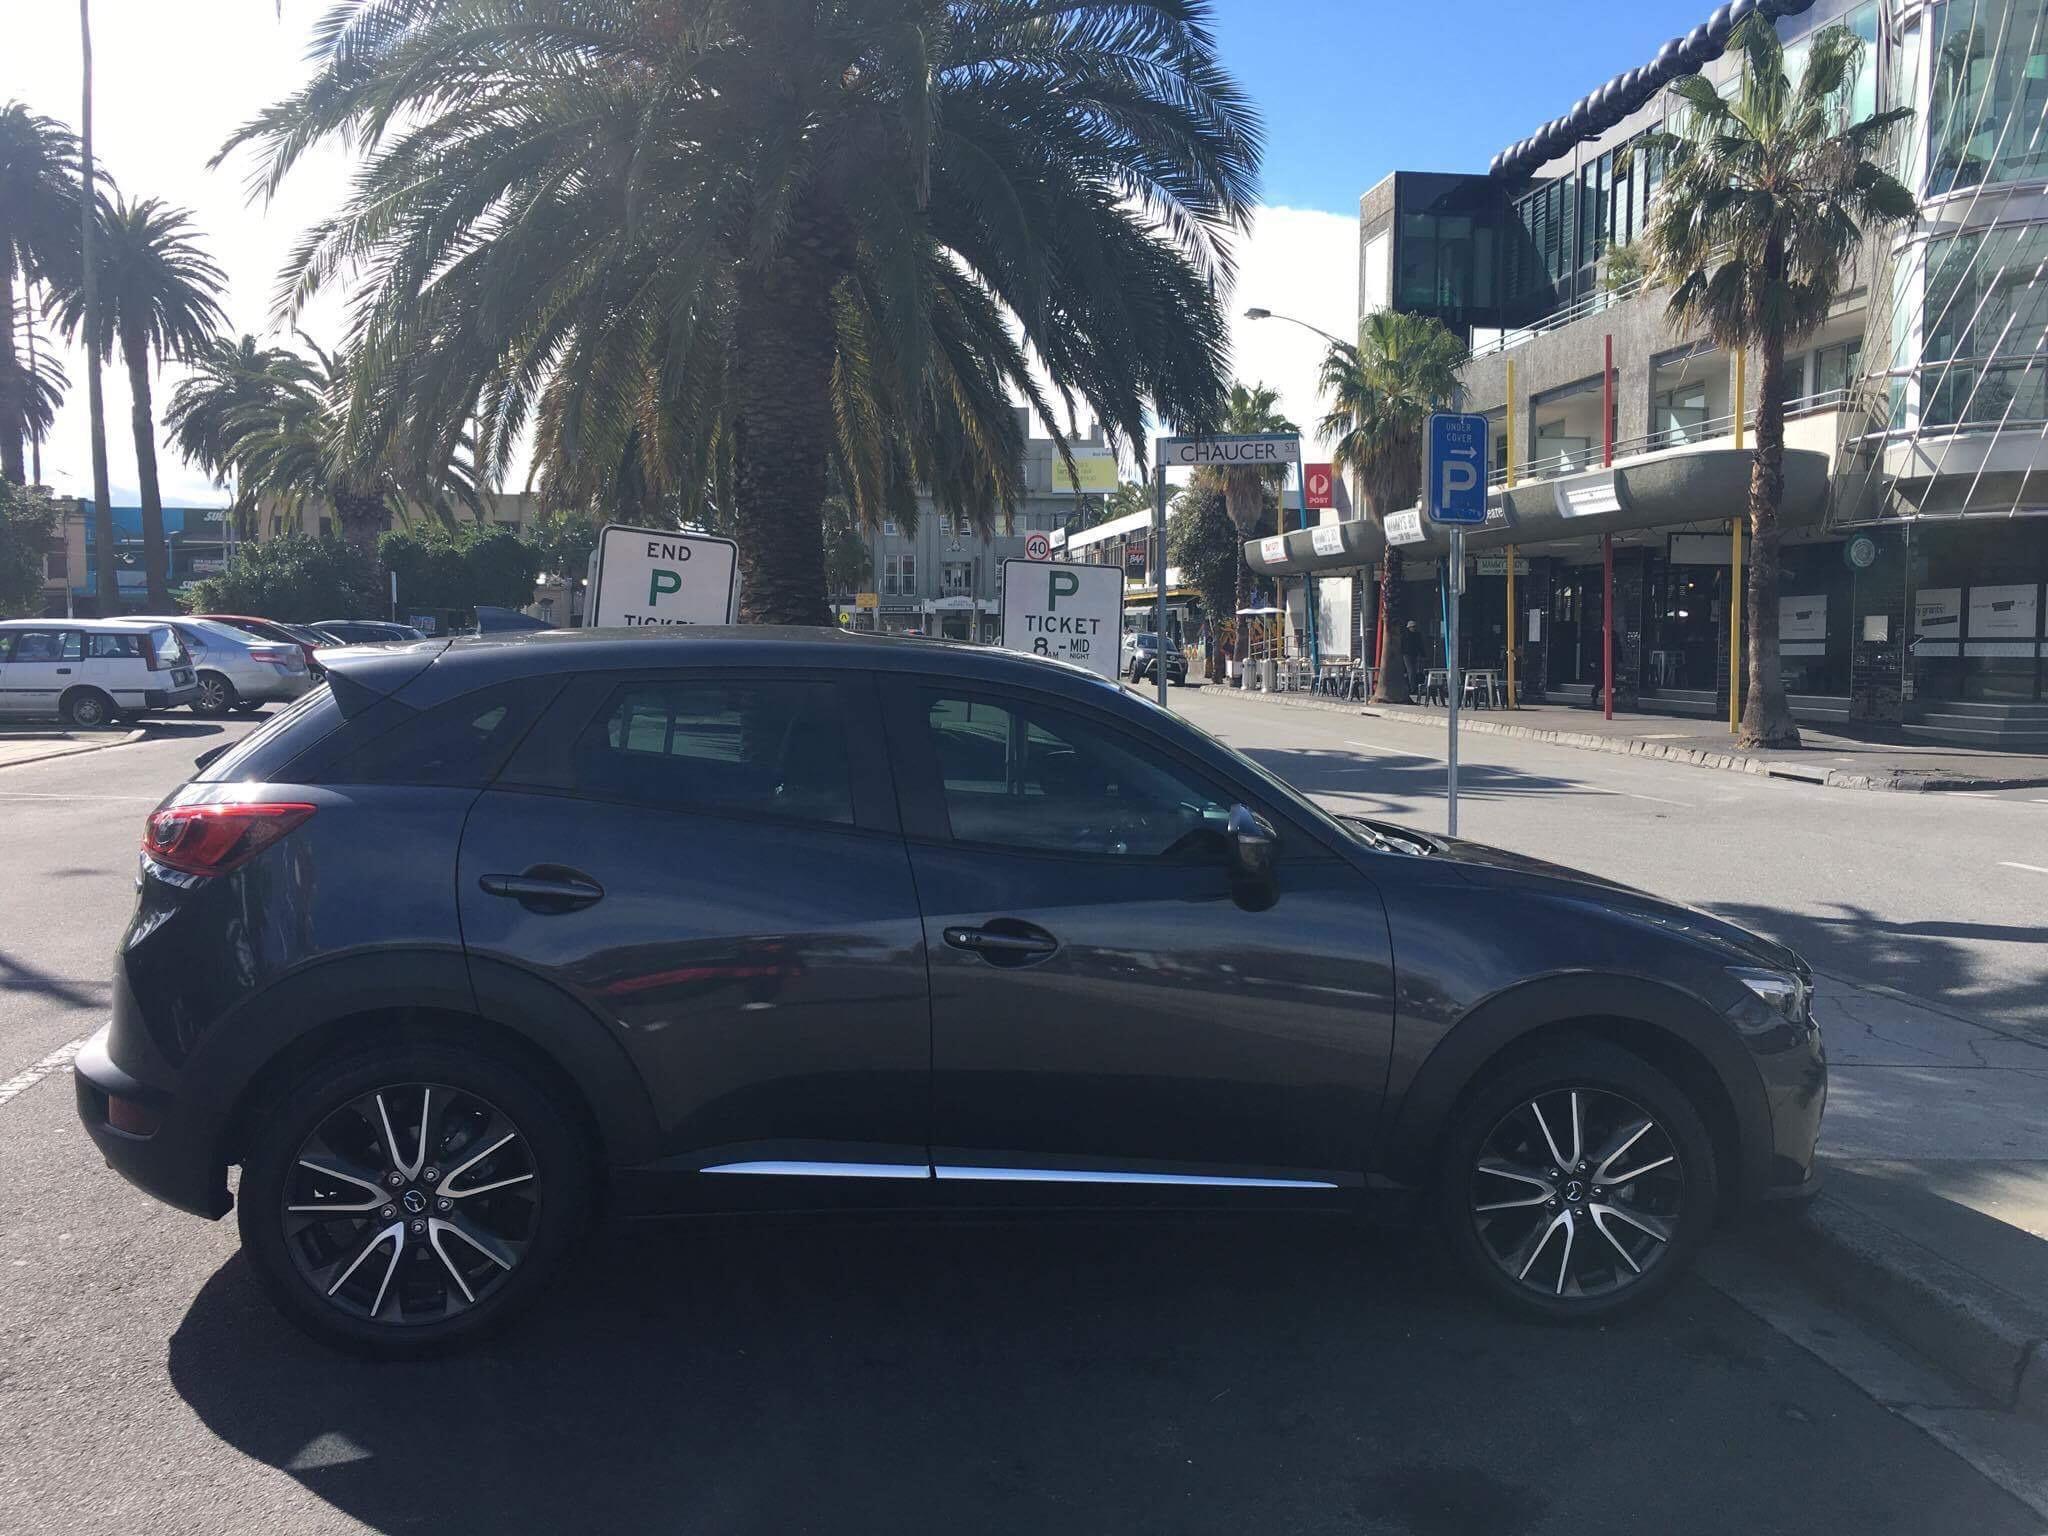 Picture of Shantel's 2016 Mazda CX3